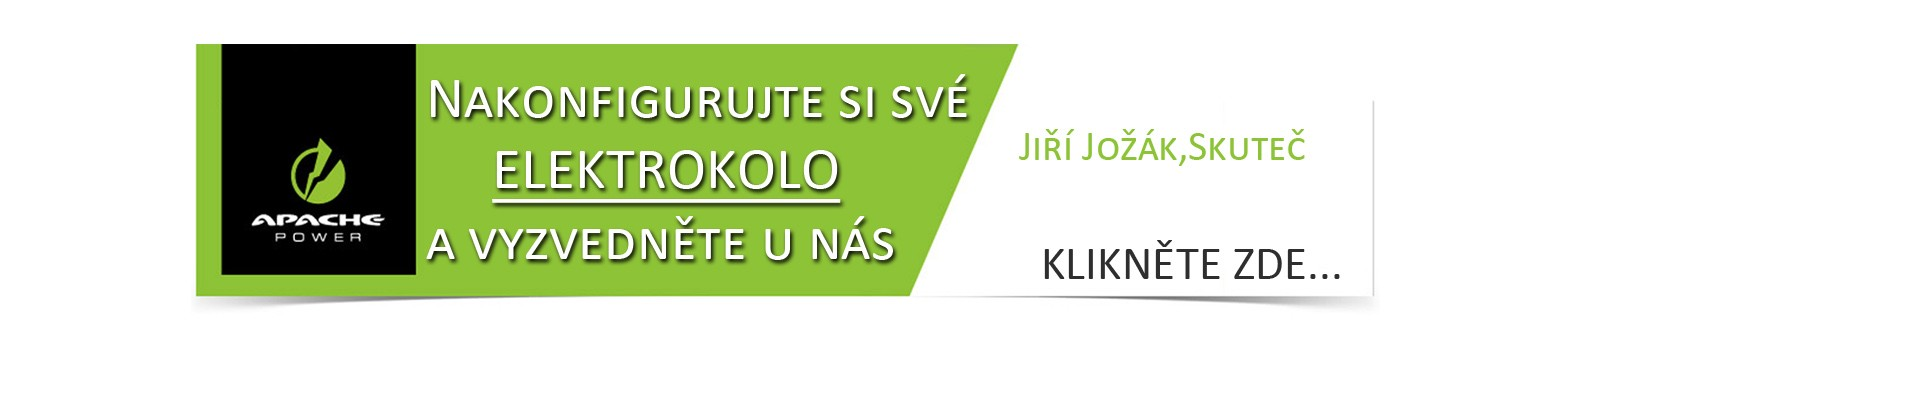 Sport Jožák - elektrokola